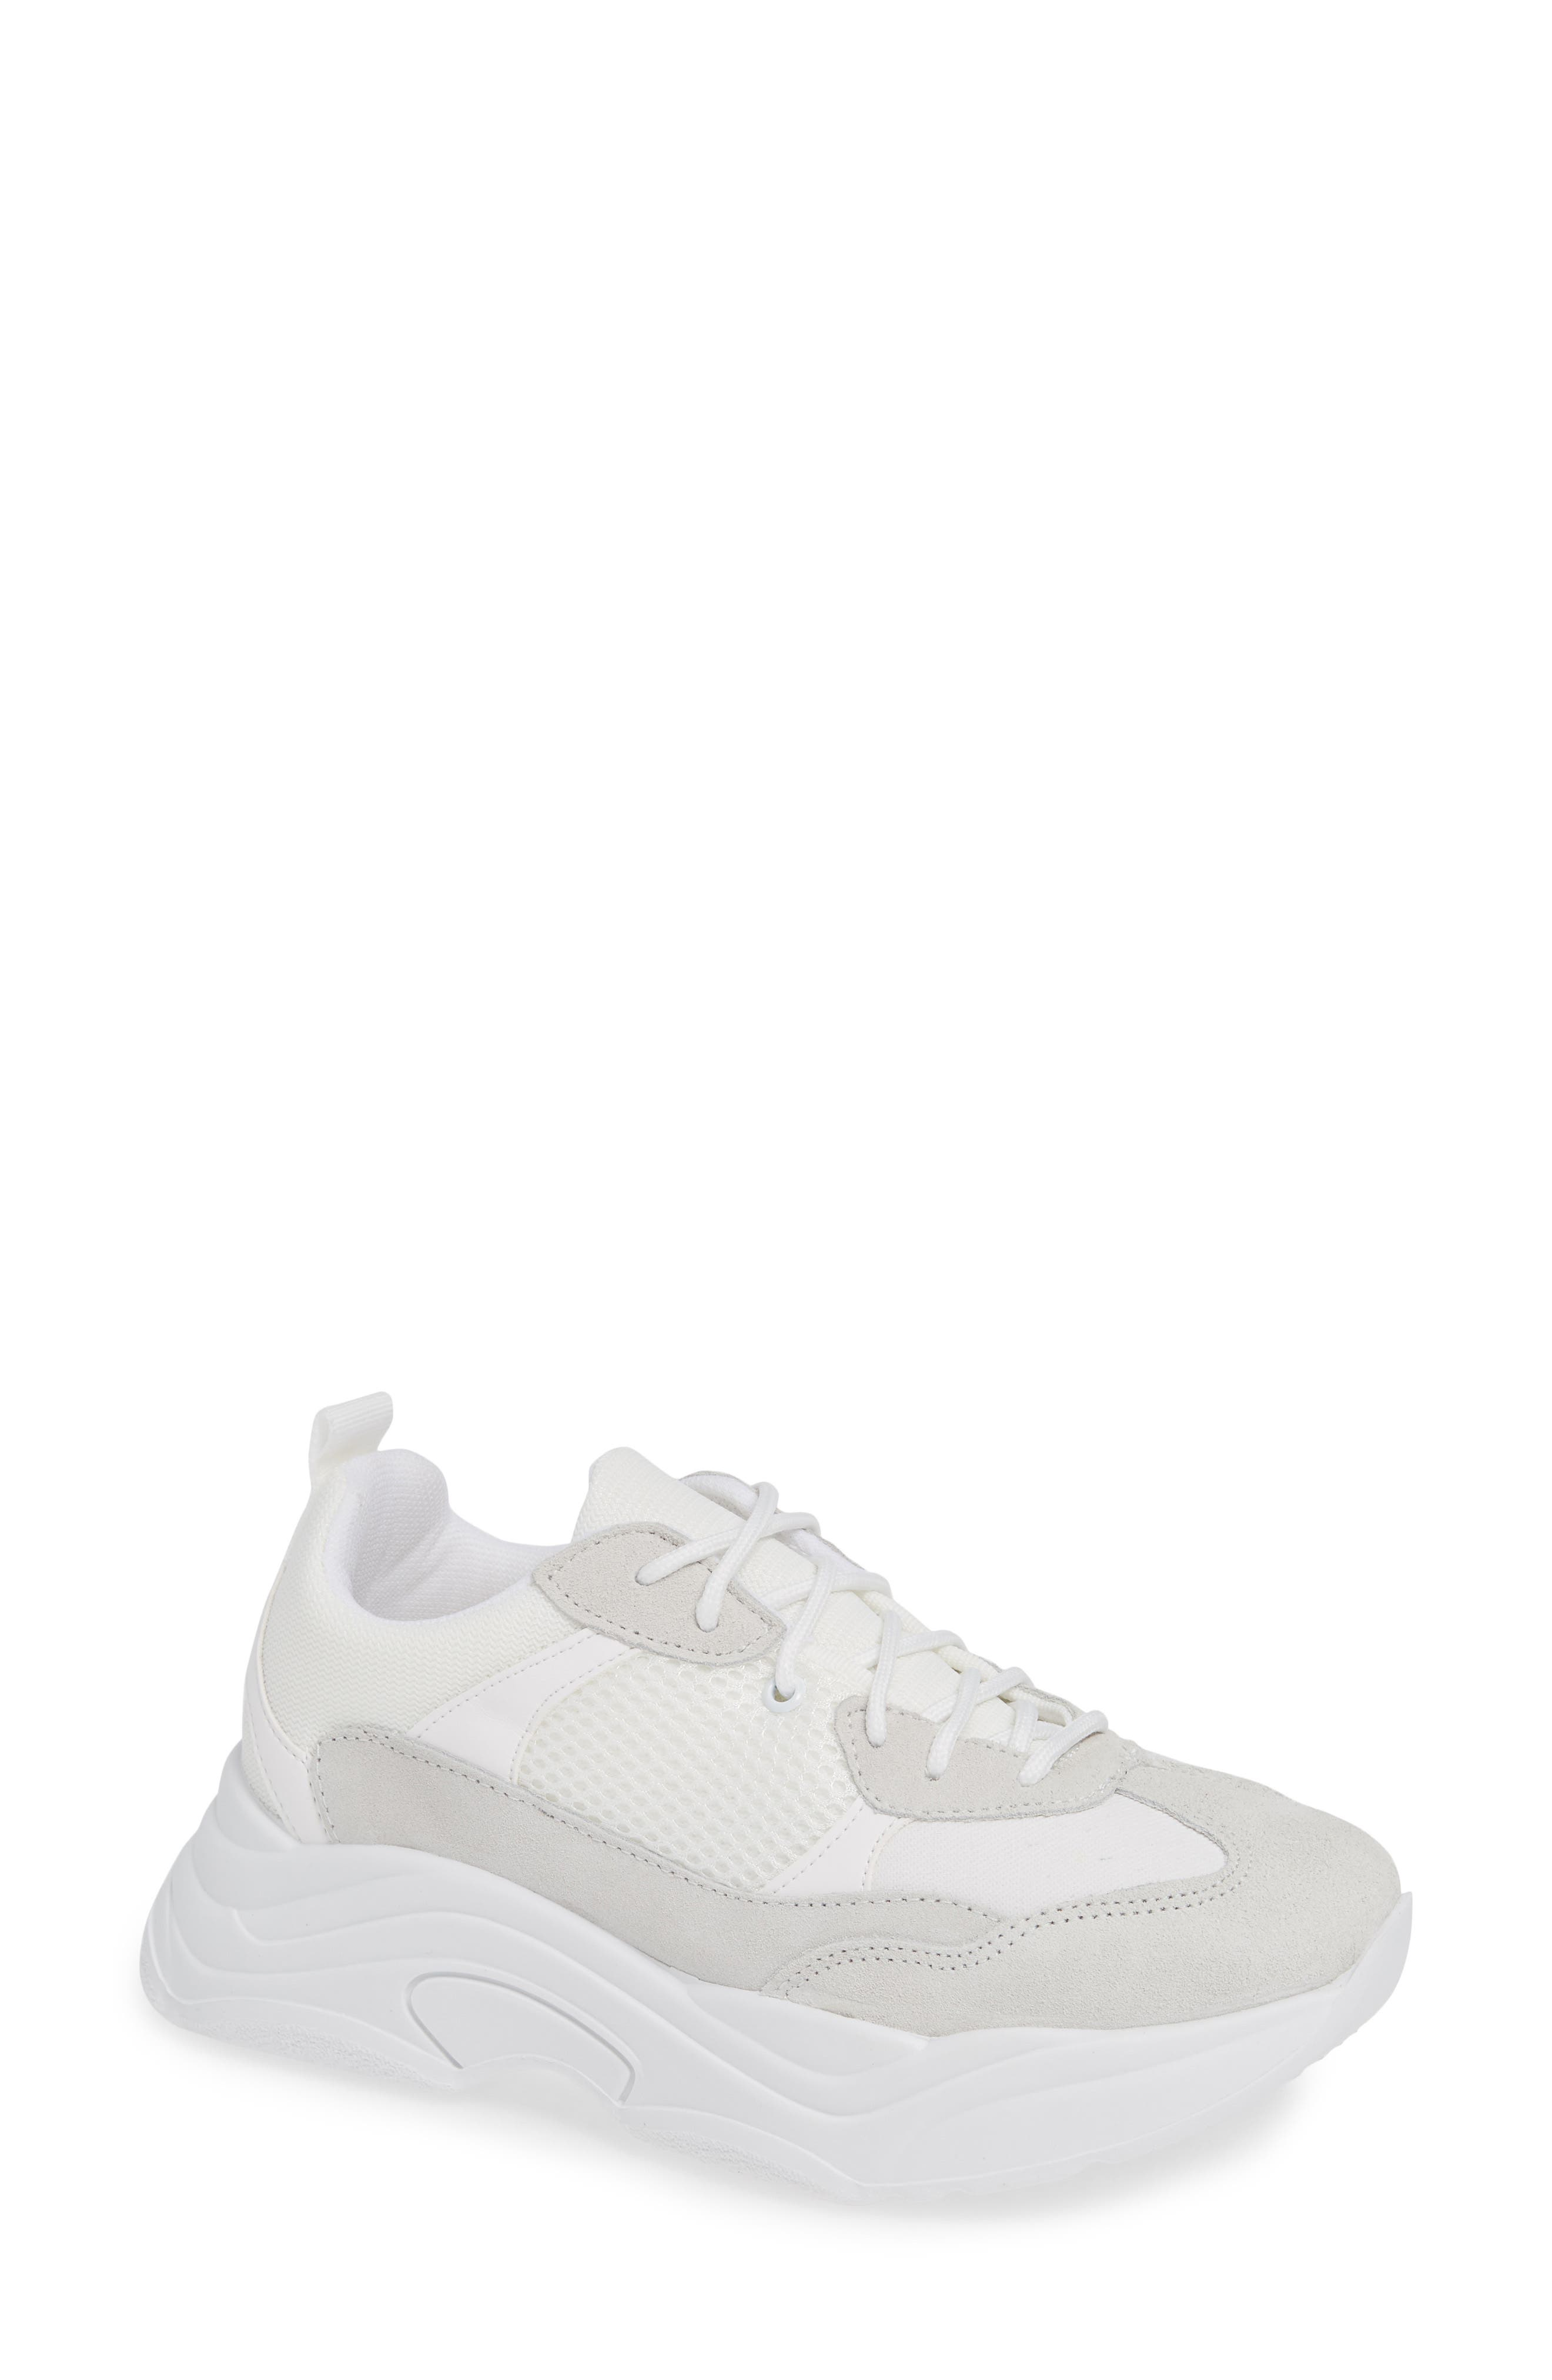 Ciara Chunky Sneaker,                         Main,                         color, WHITE MULTI